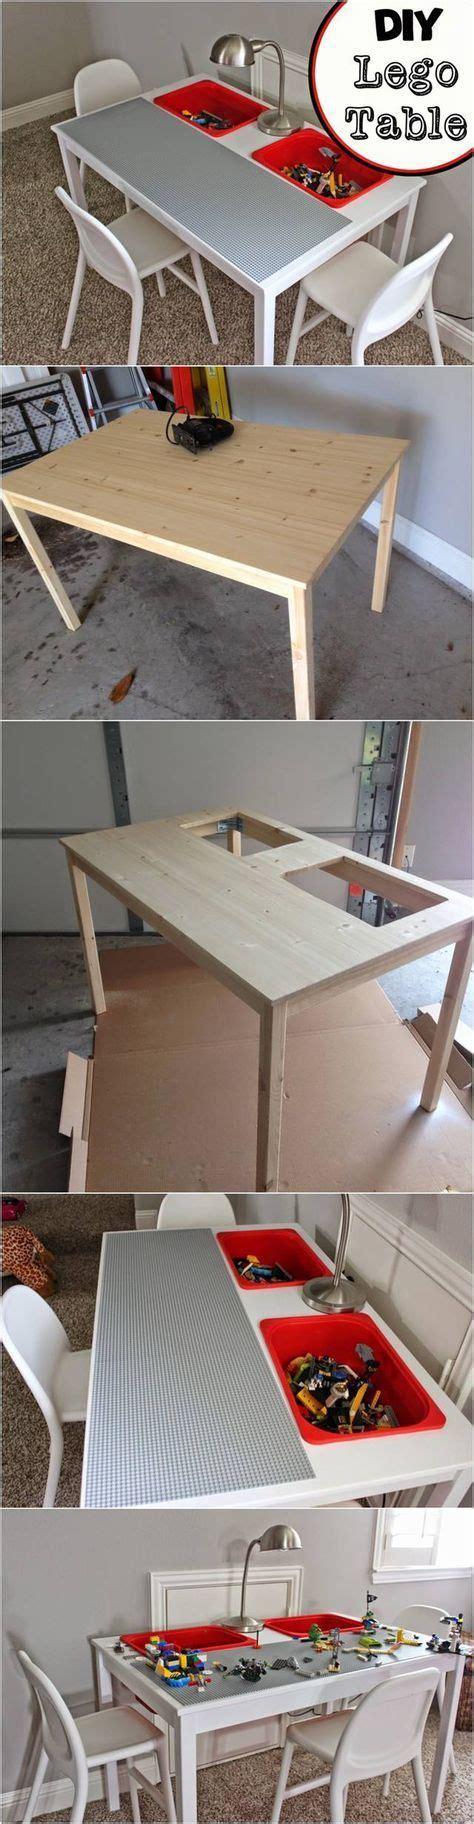 reddit diy lego table 13 amazing ikea hacks to diy